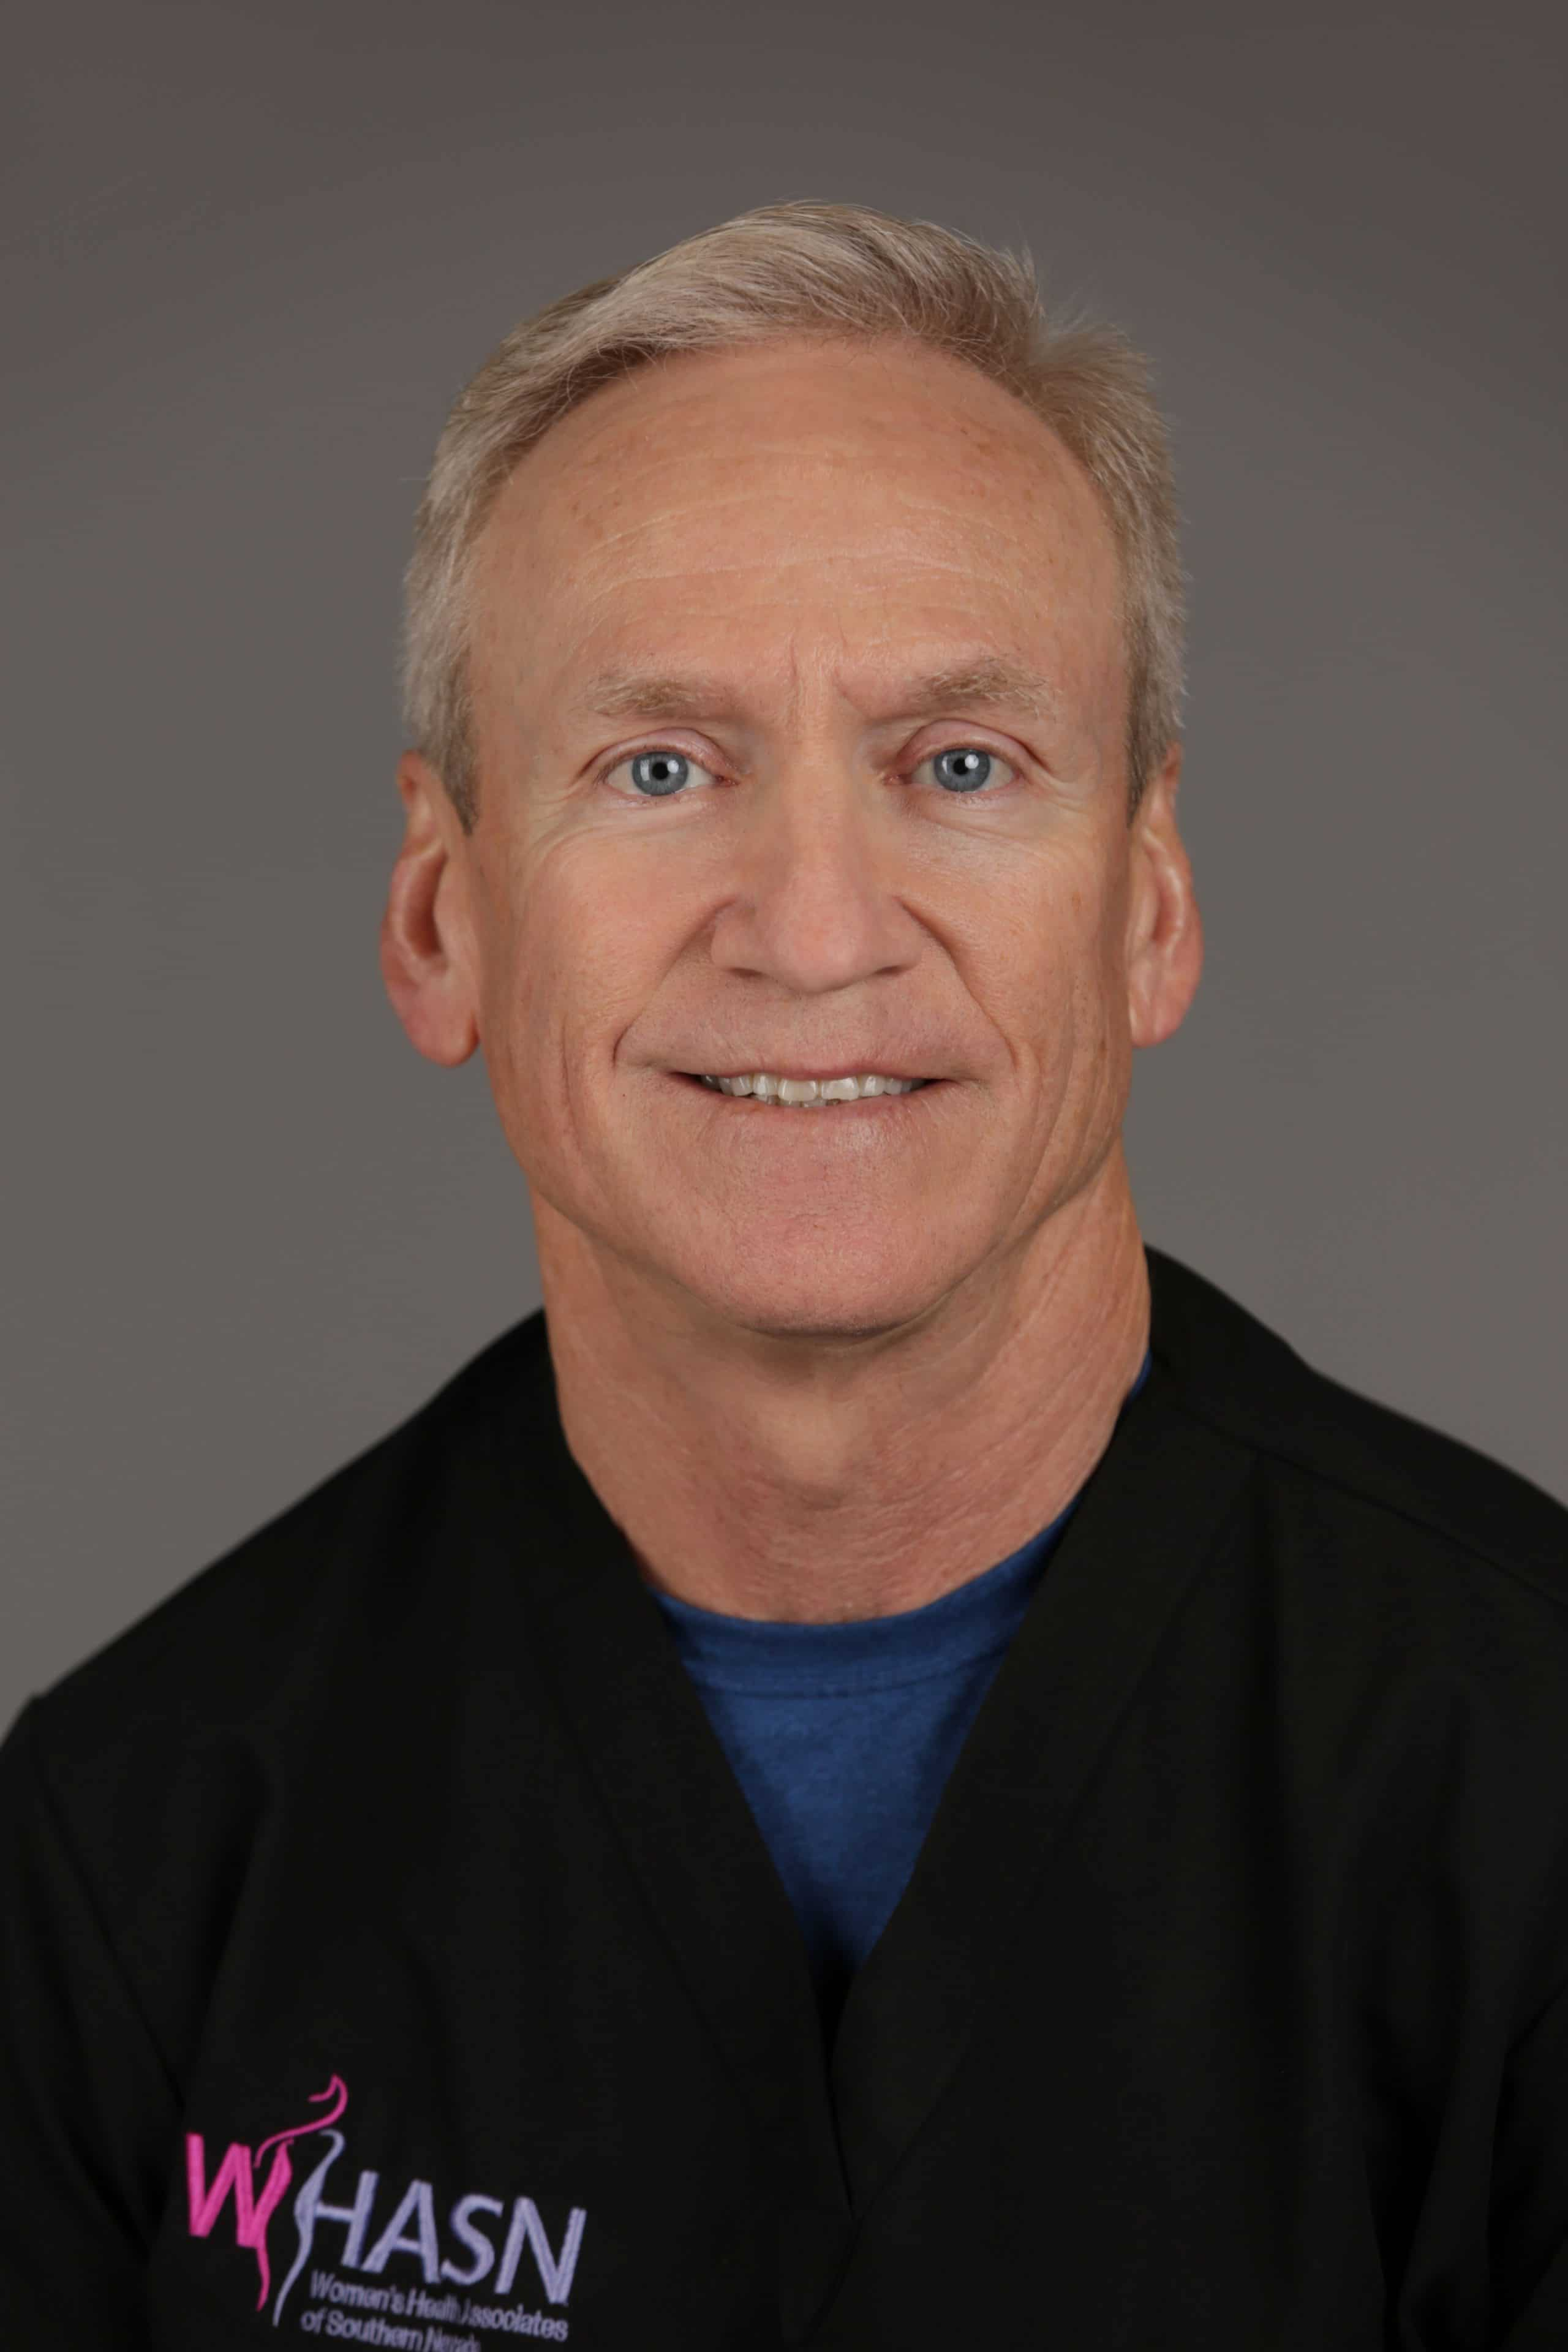 Joseph Watson, MD_WHASN Aliante, City Center